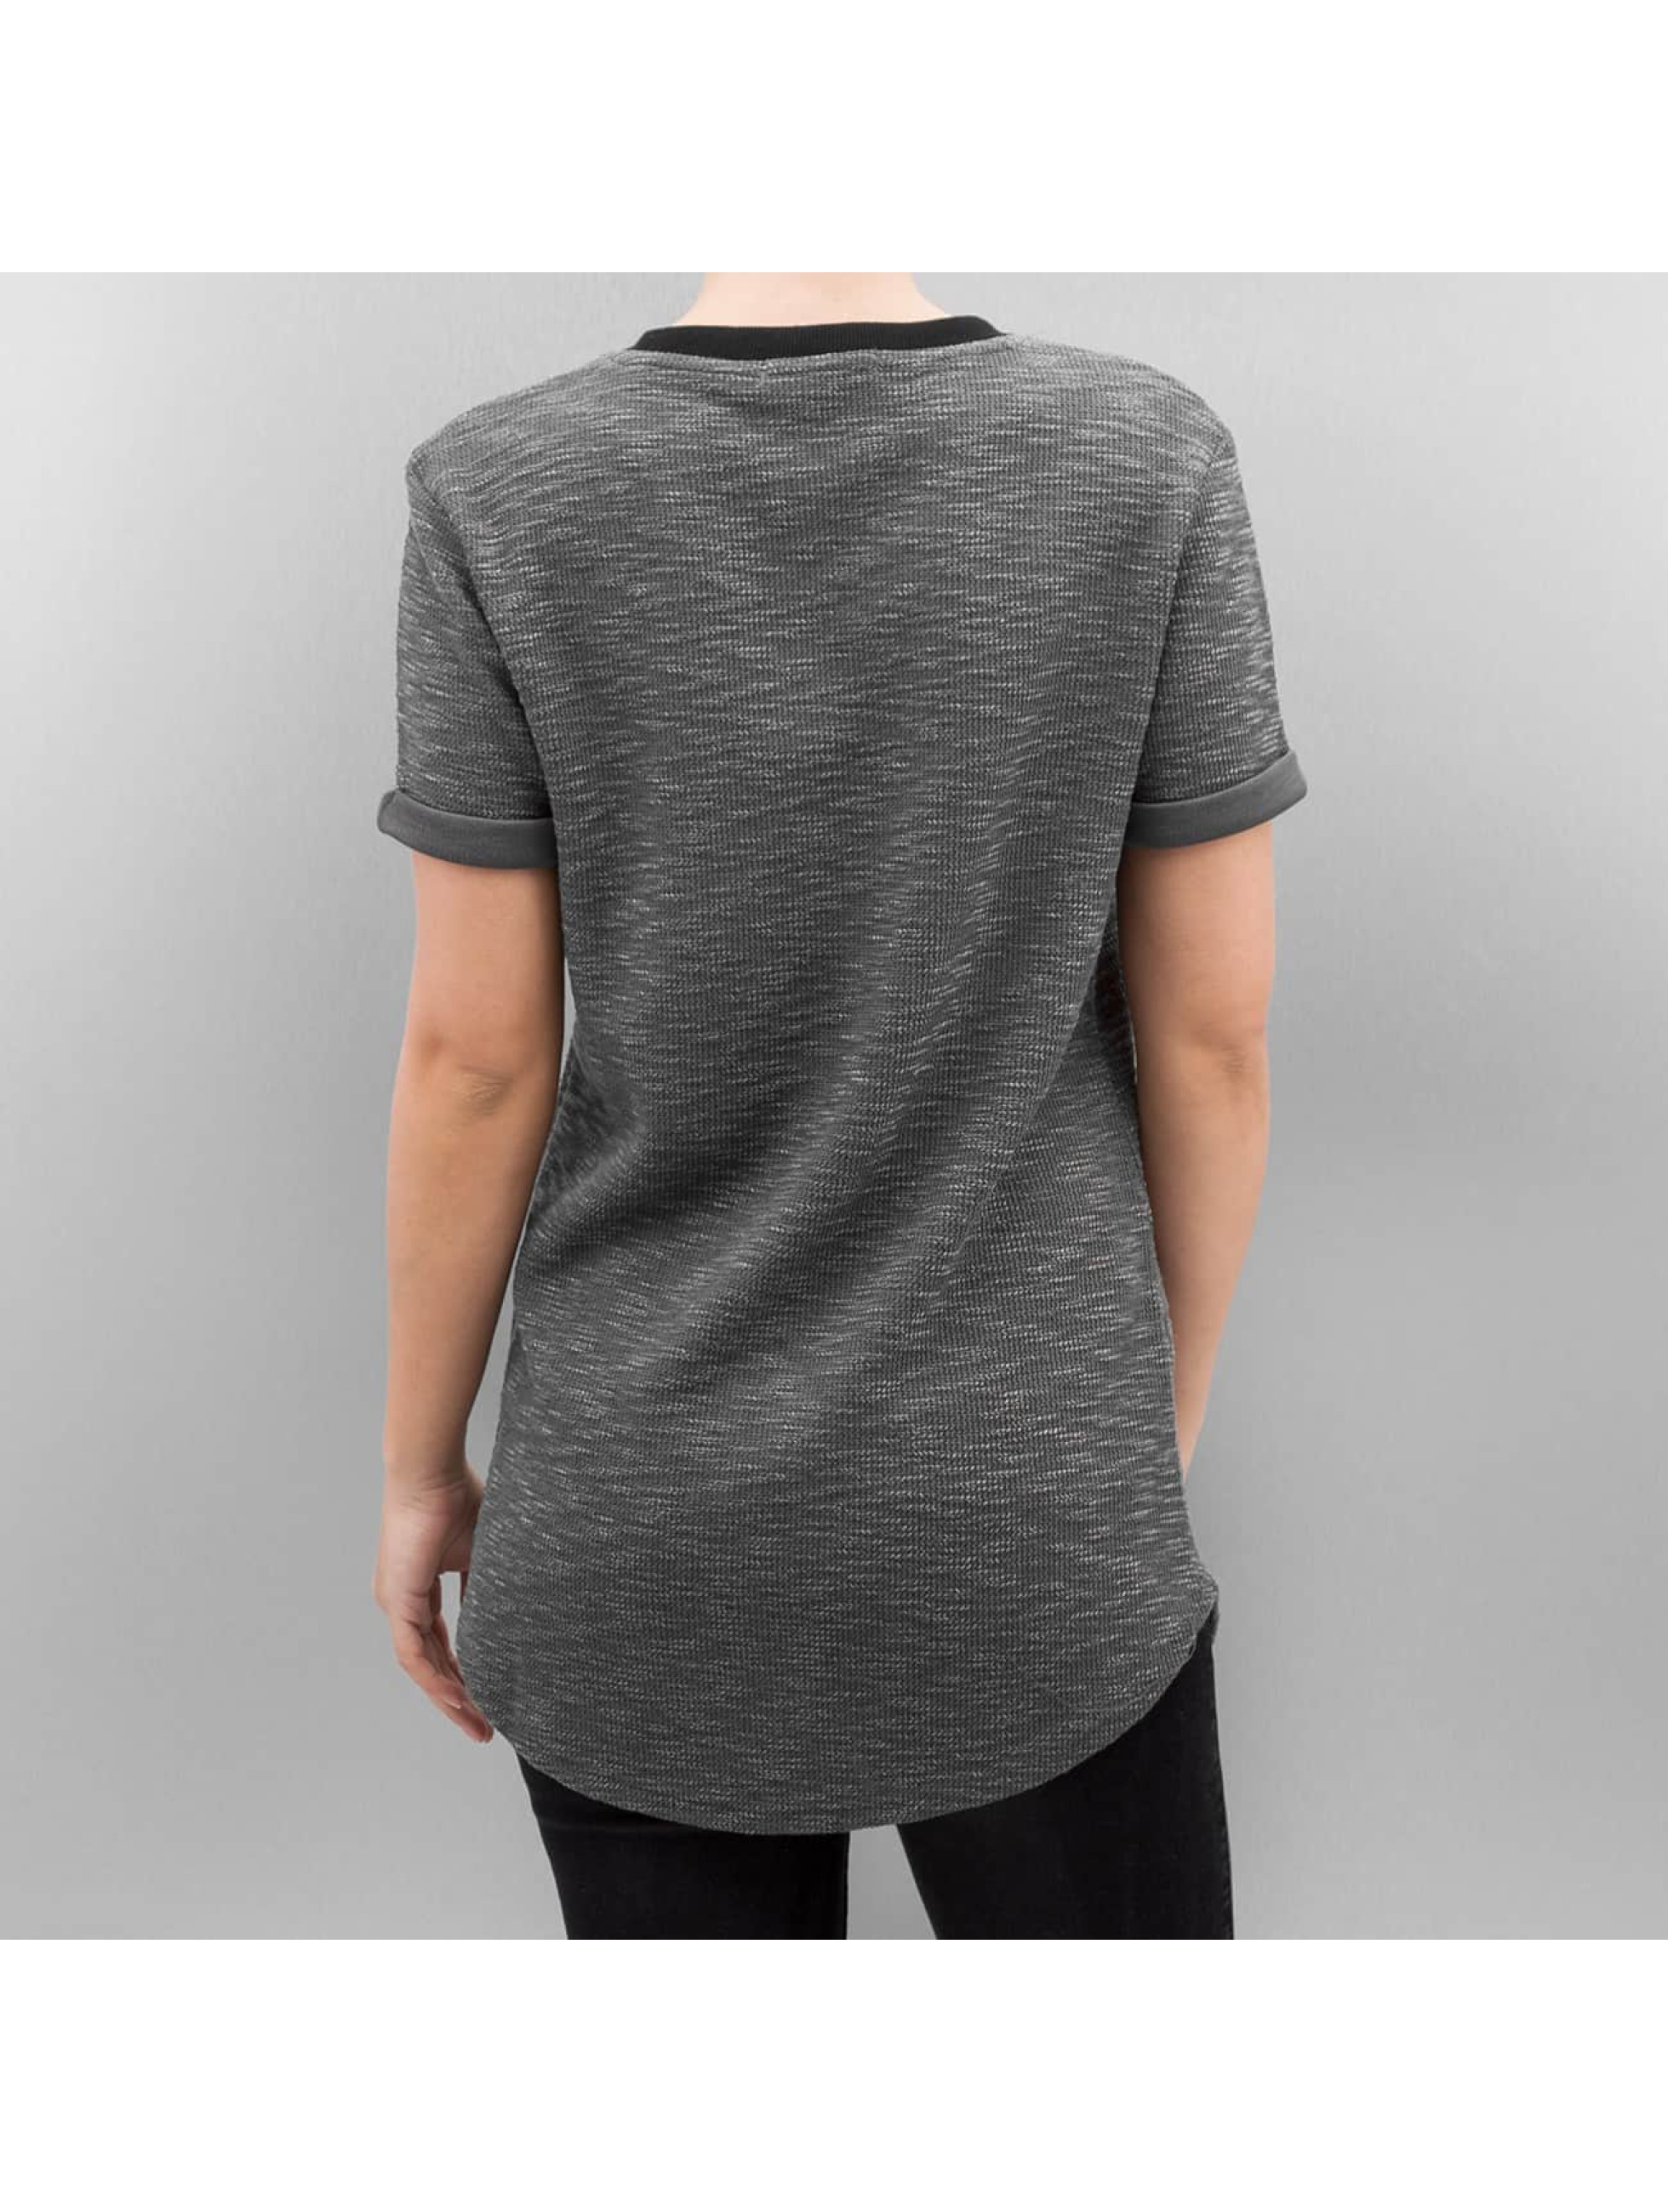 Paris Premium Tall Tees Knit grey